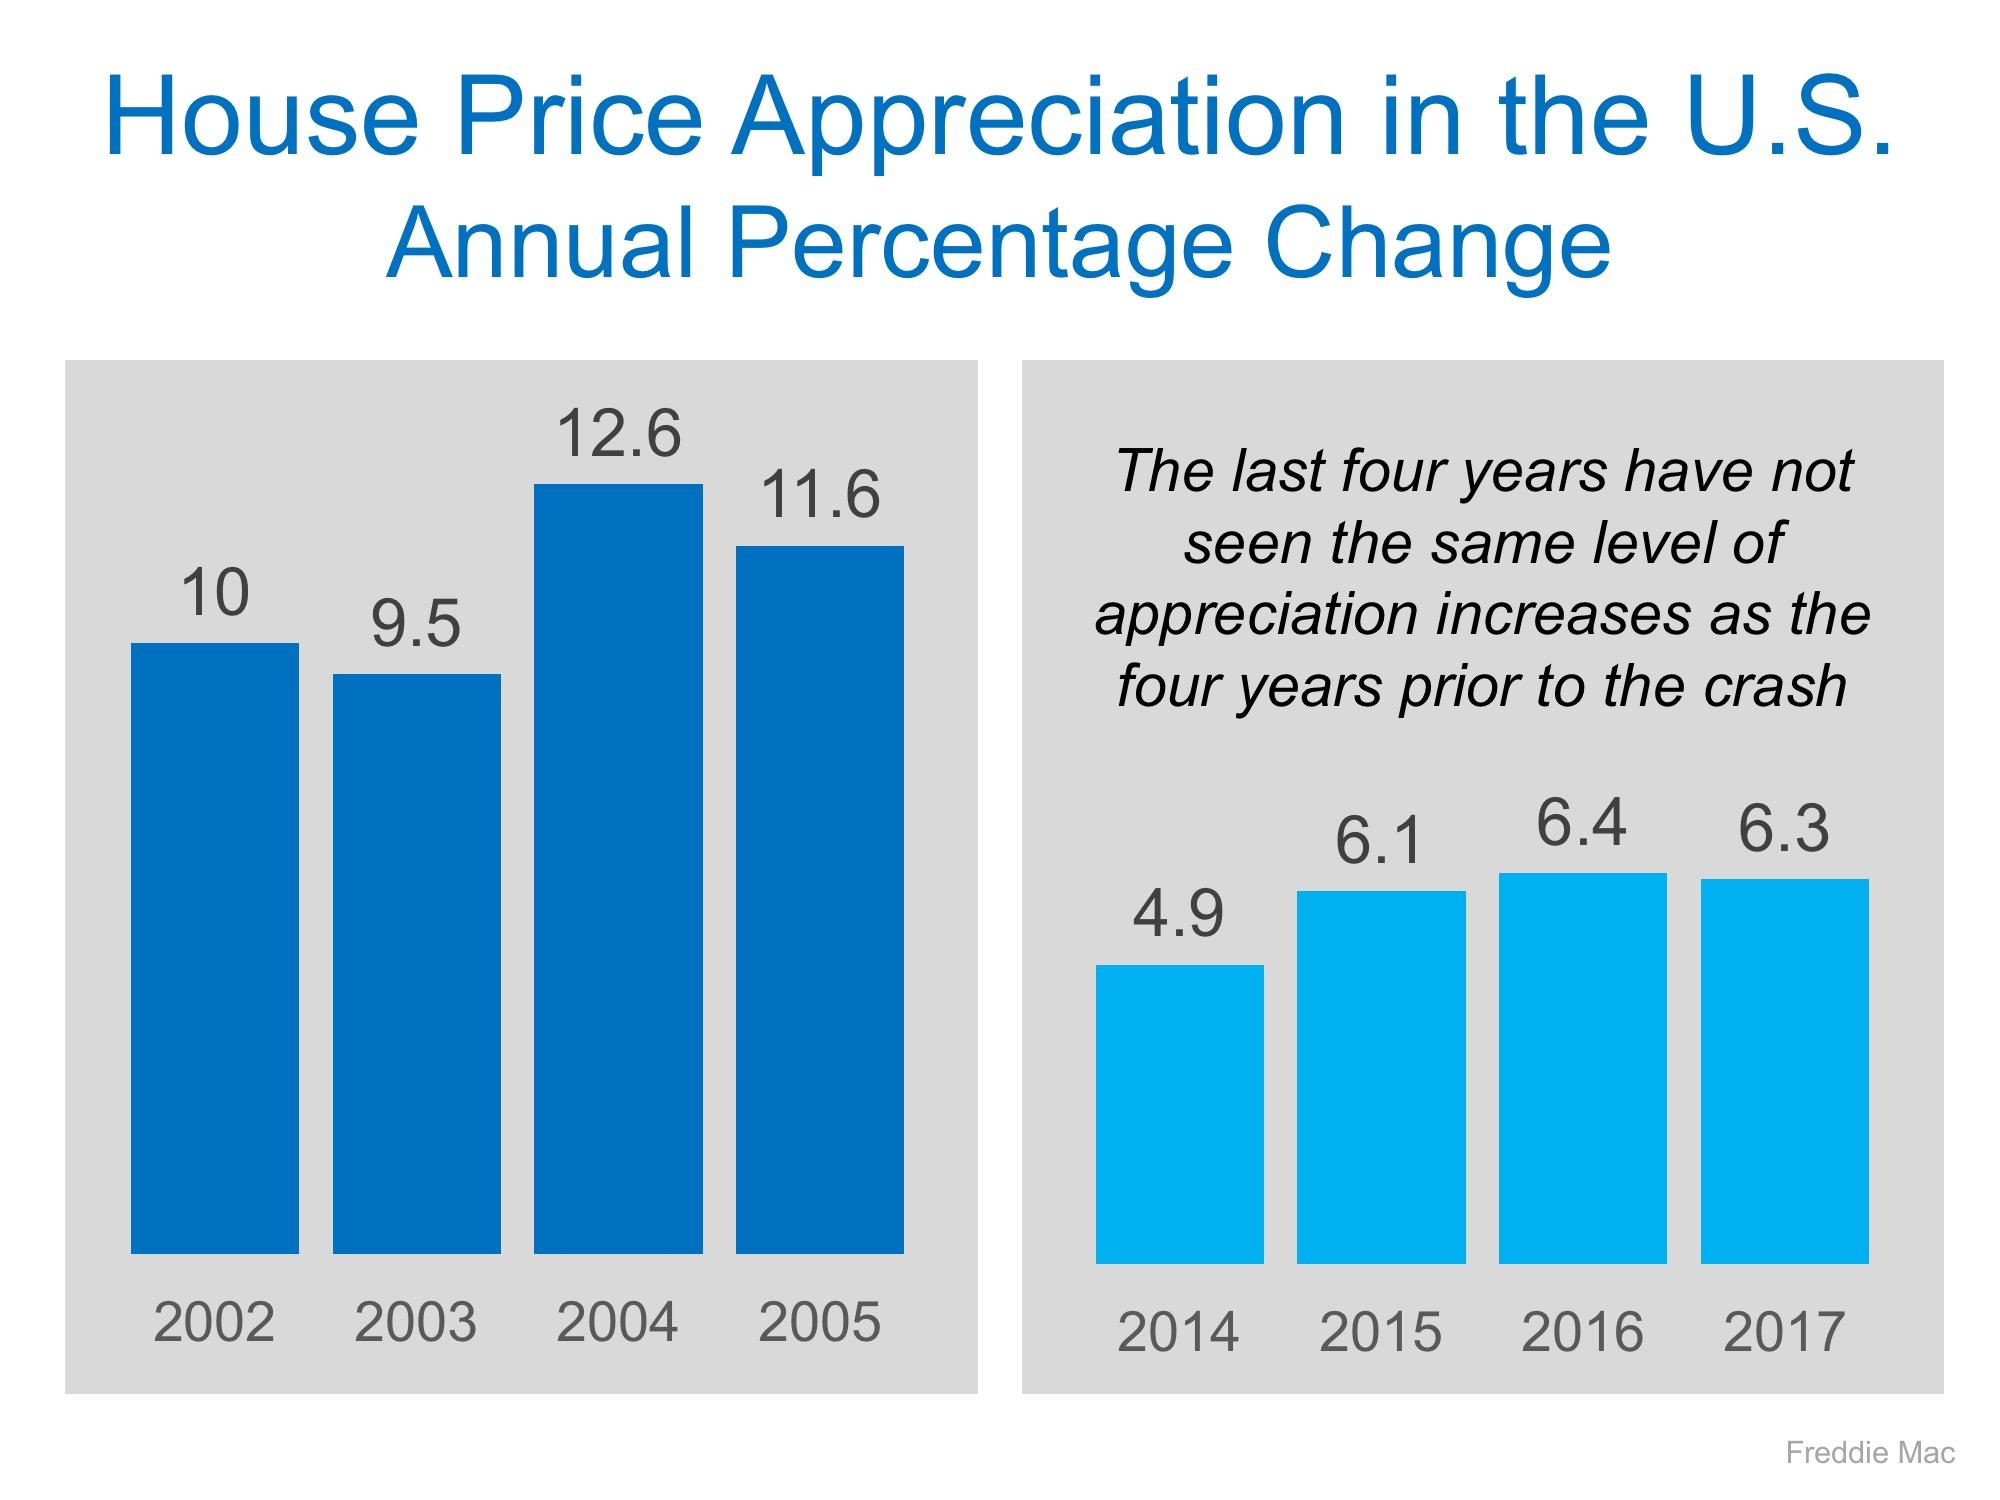 Housing Price Appreciation 2017